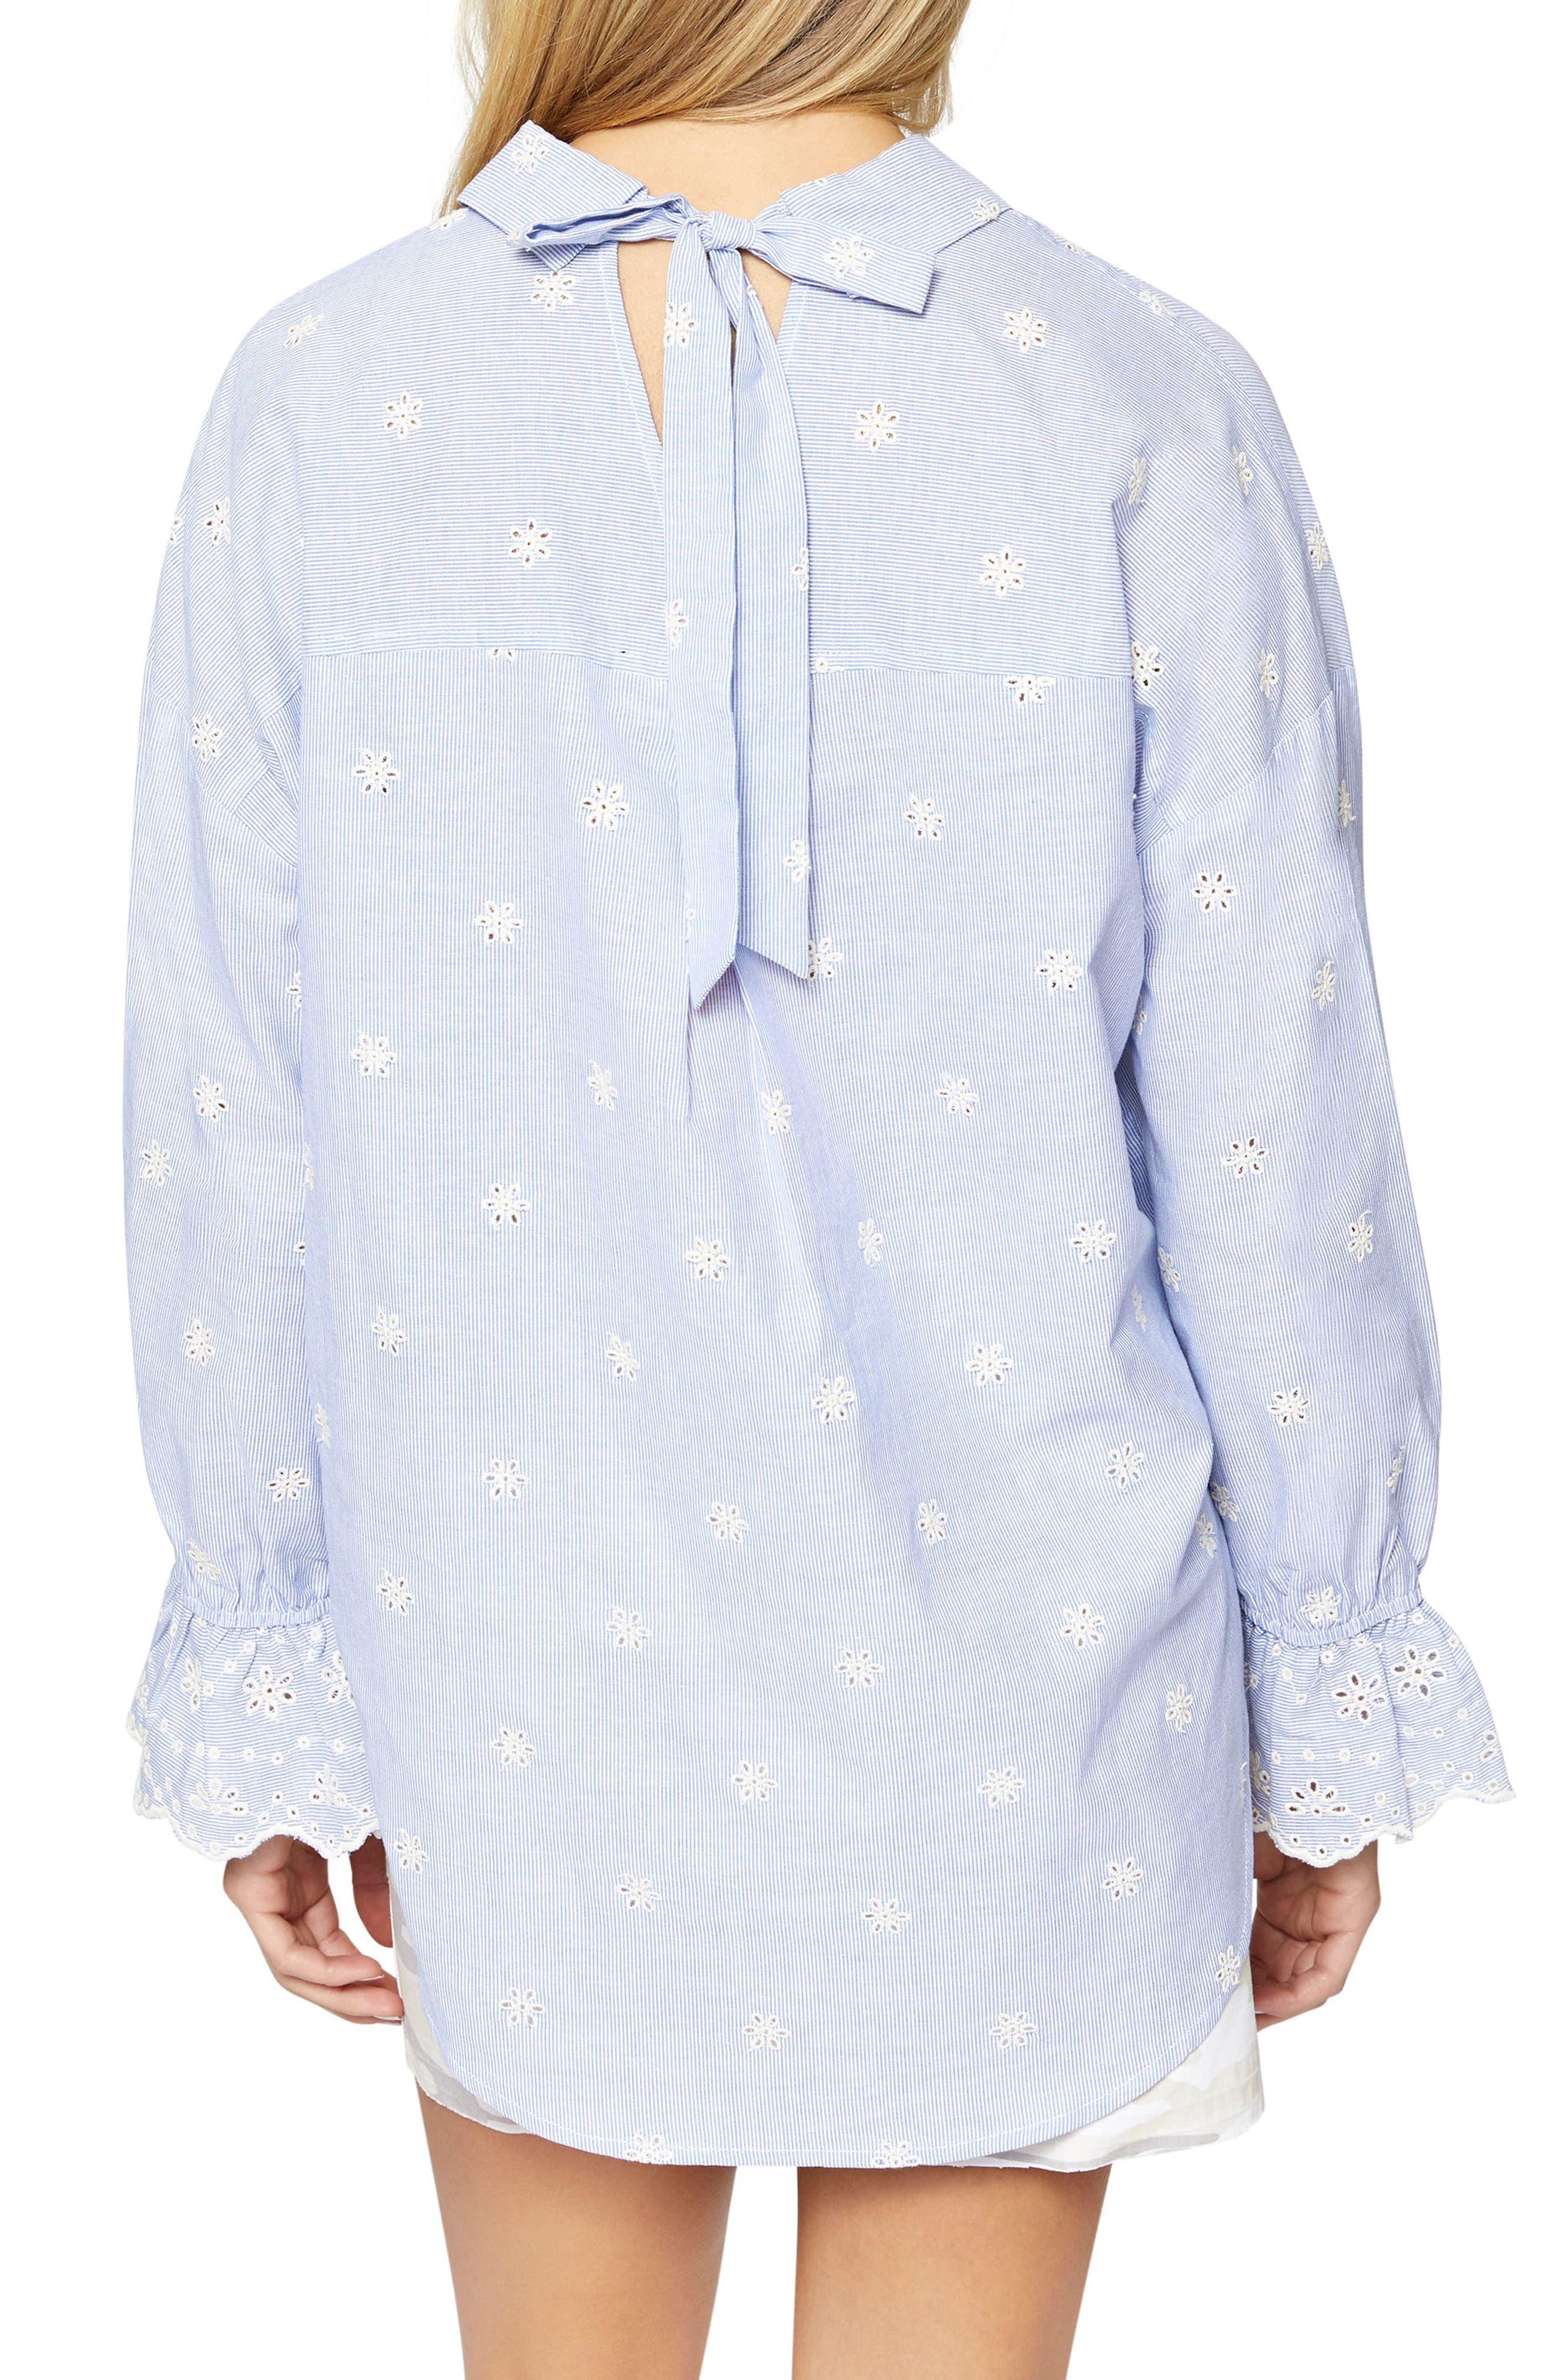 Hazel Boy Eyelet Shirt,                             Alternate thumbnail 2, color,                             BABY TICKING STRIPE